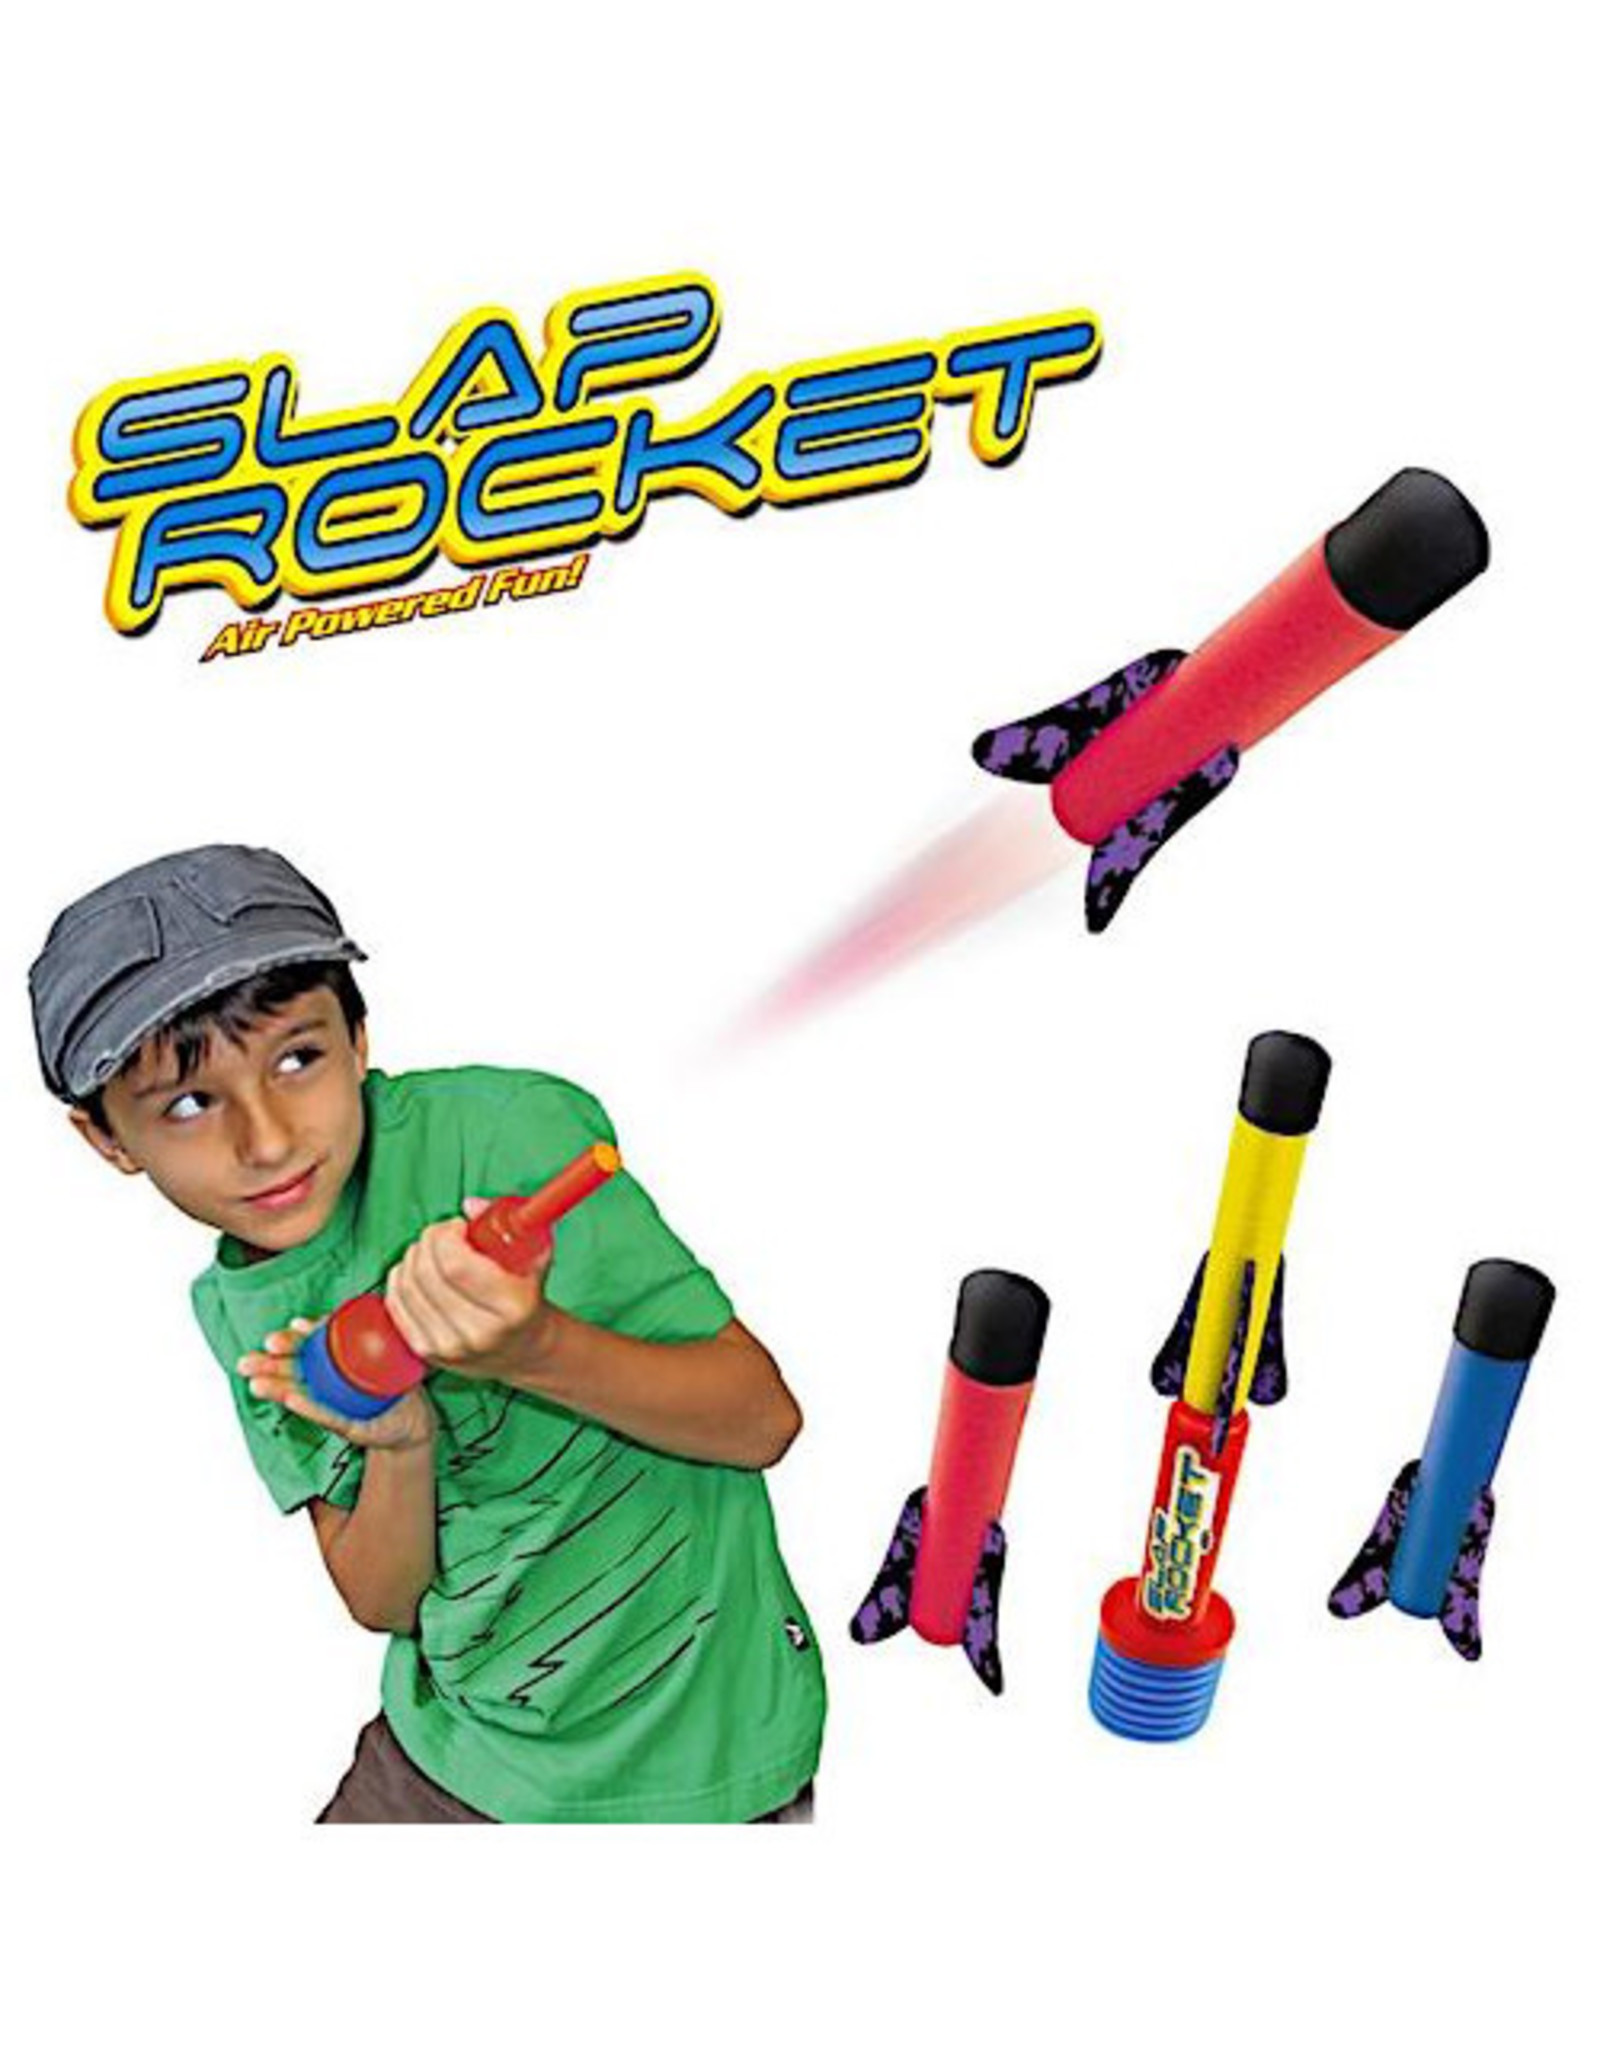 Aeromax SLAP ROCKET Set with 3 Rockets